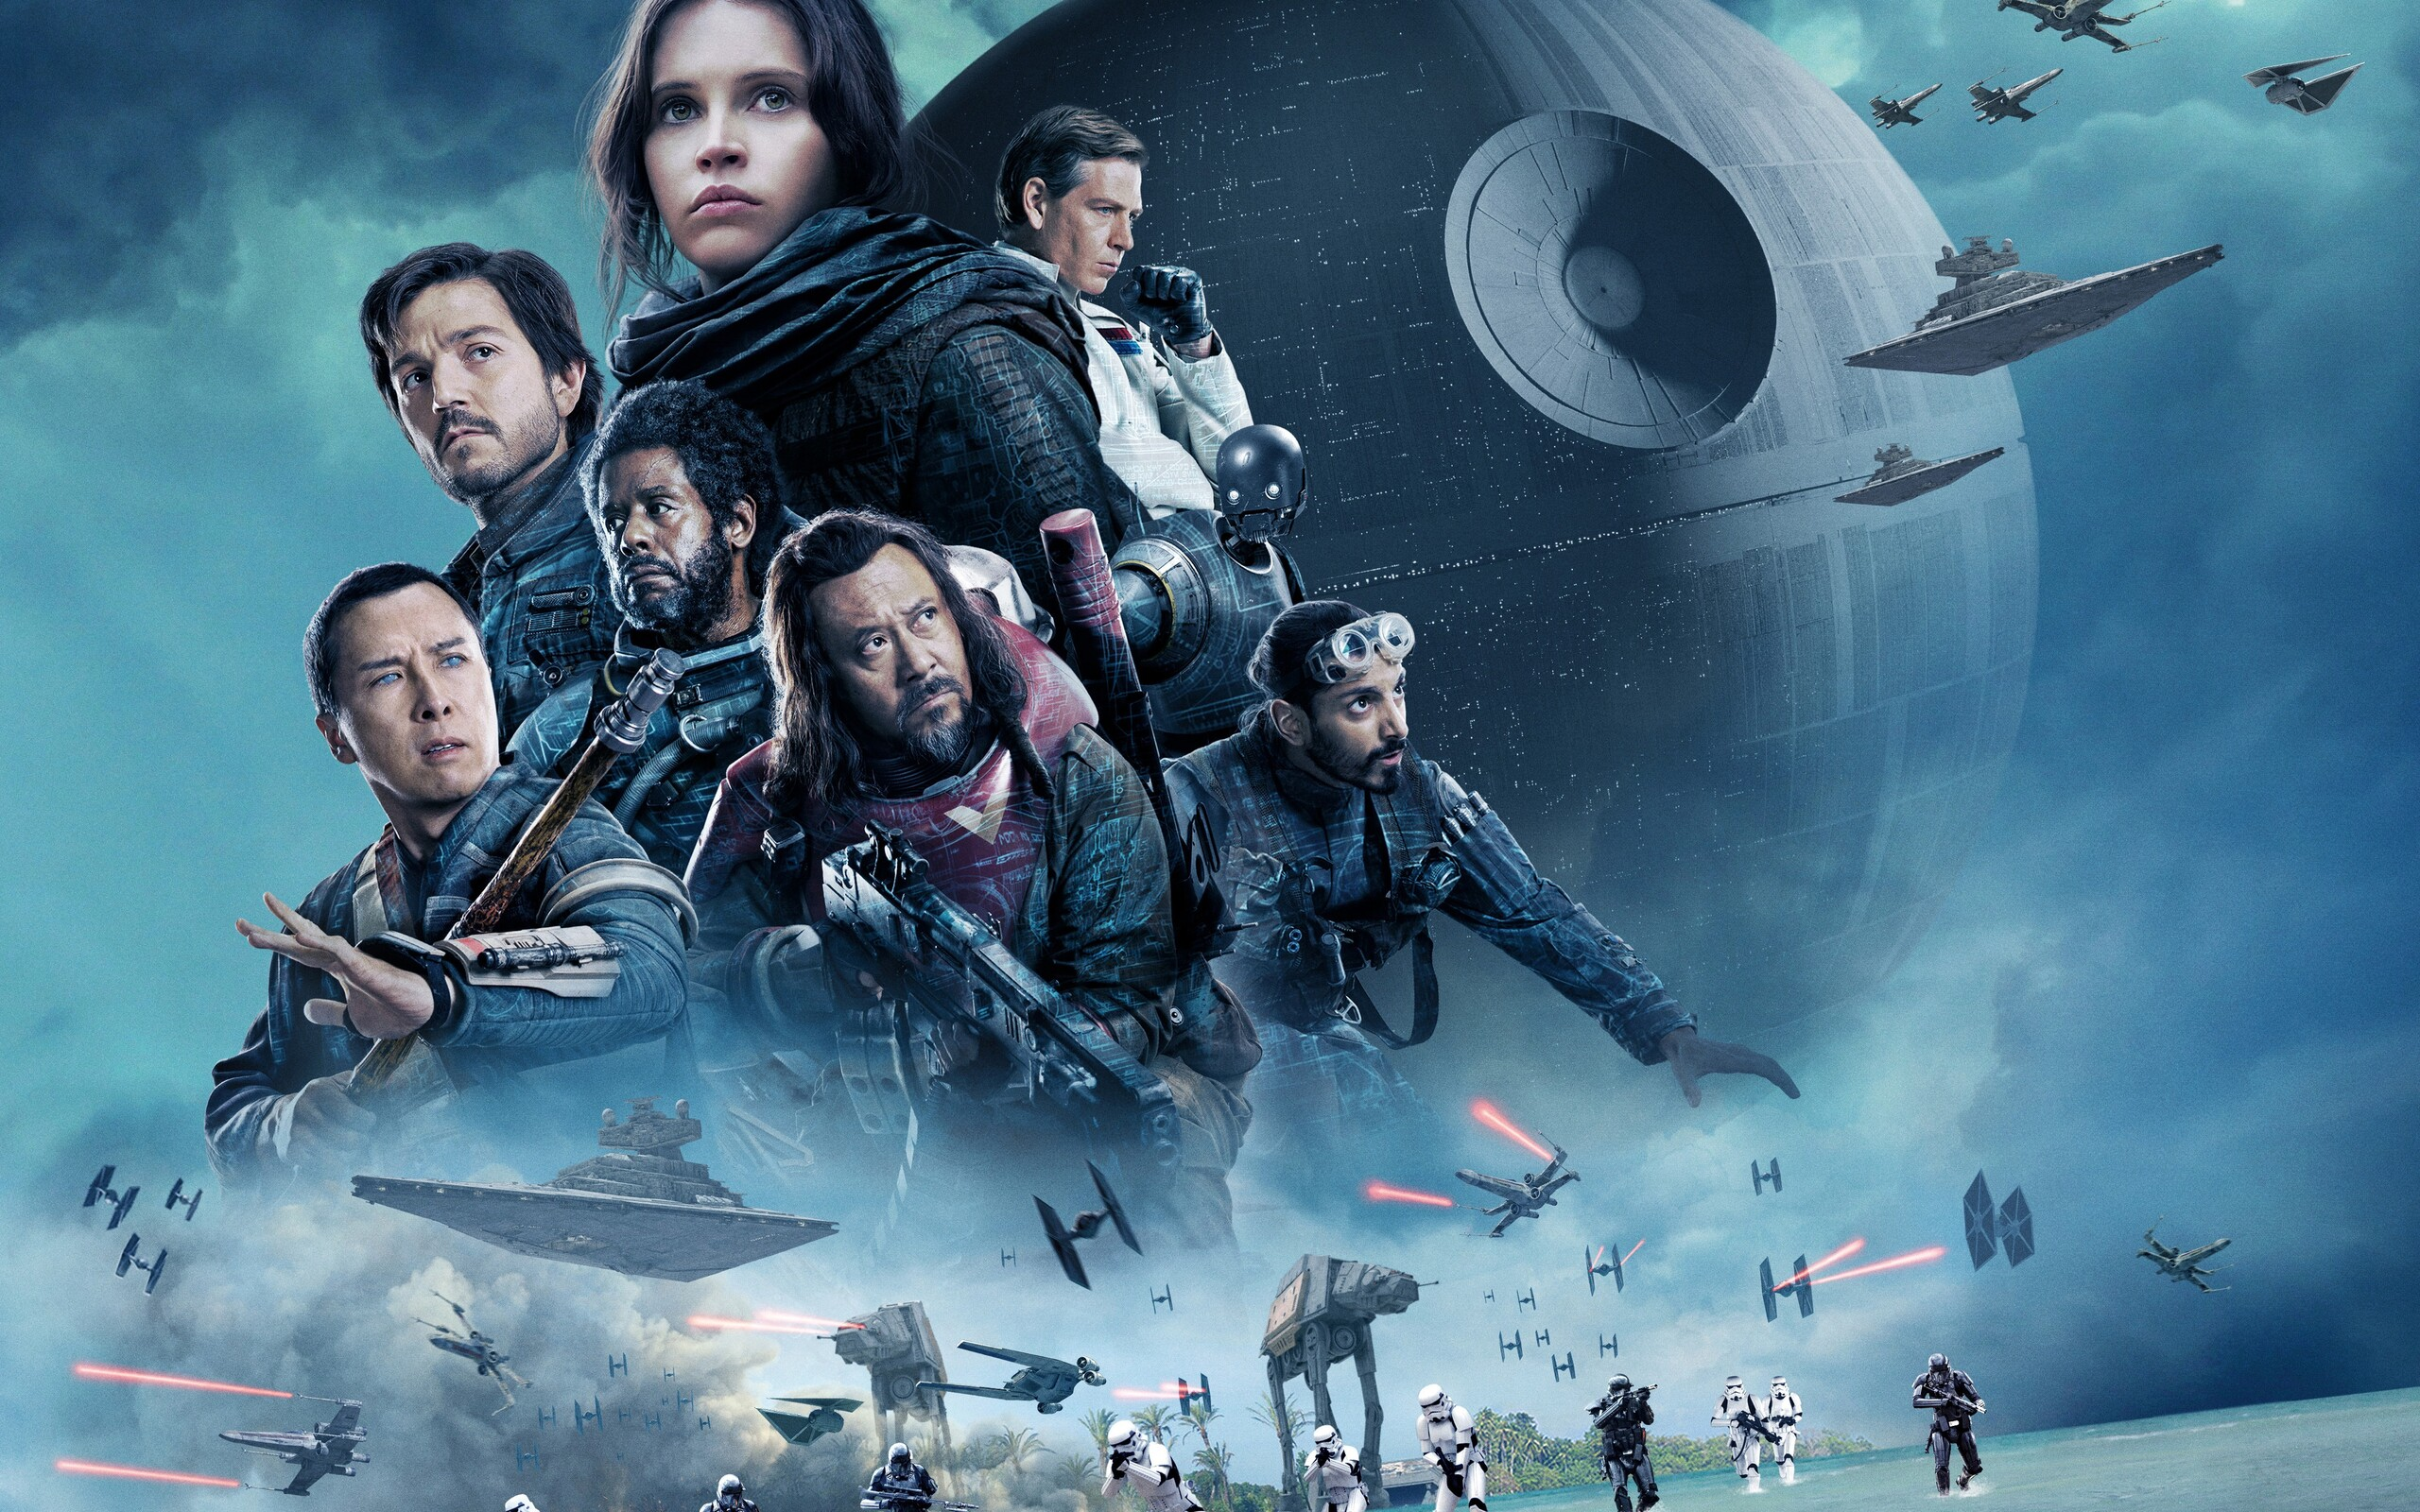 Star Wars Rogue One Wallpaper: 2560x1600 Rogue One A Star Wars Story 5k 2017 2560x1600